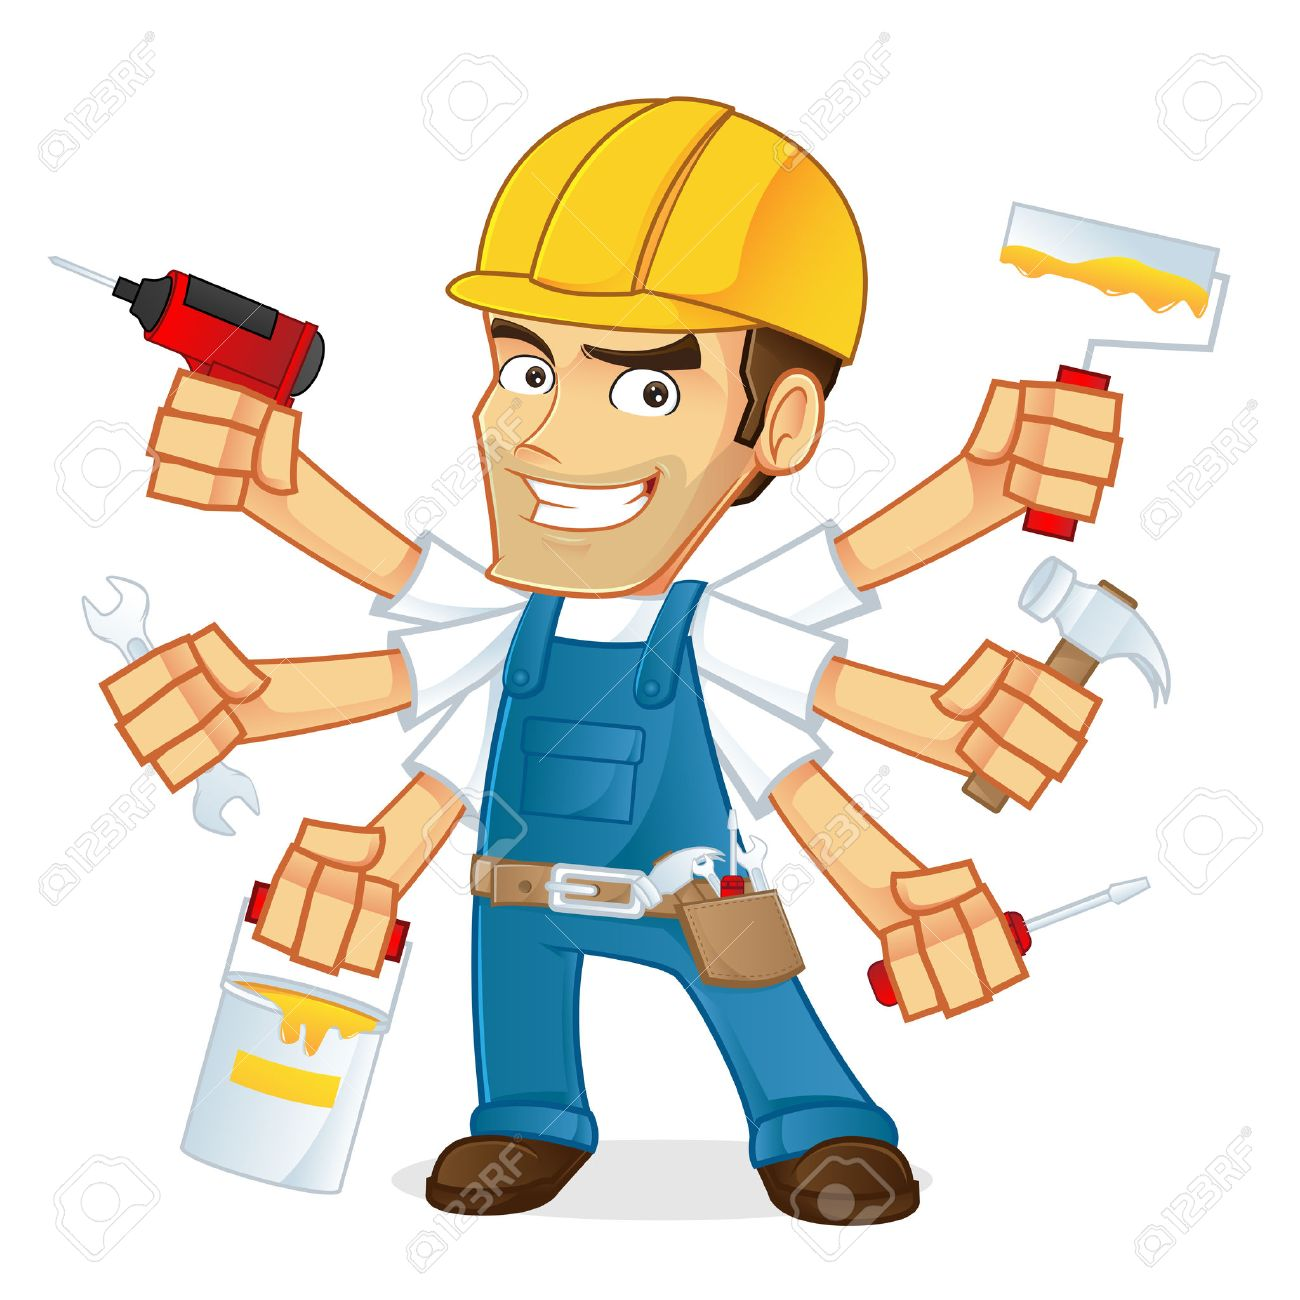 Handyman holding multiple tools - 50297578